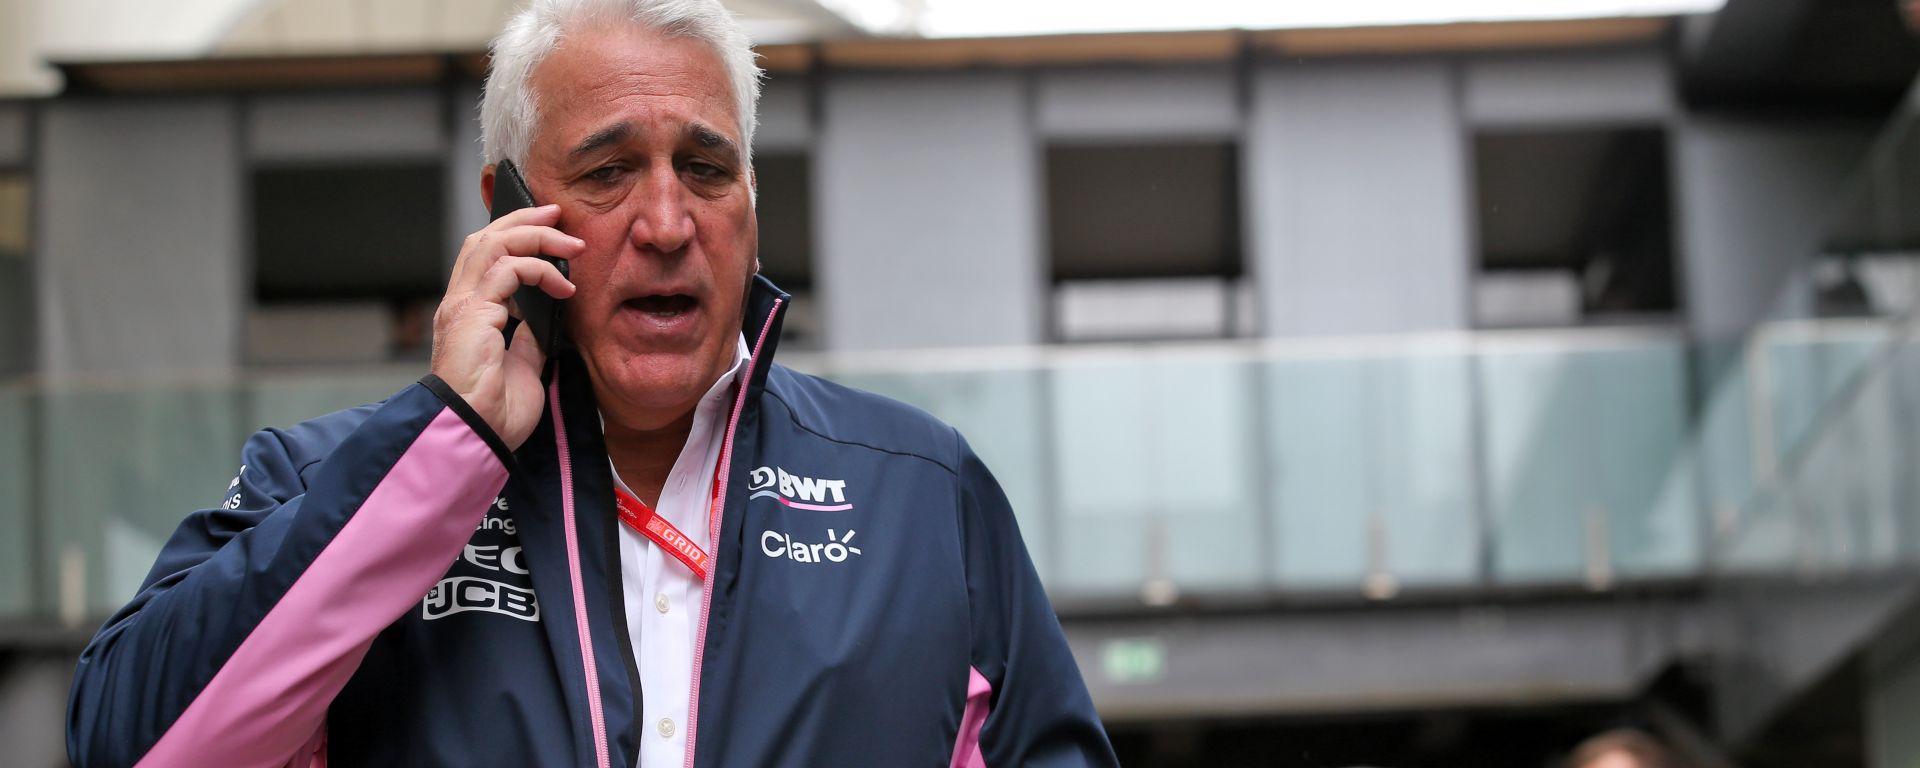 Lawrence Stroll (Racing Point), GP Brasile 2019, Interlagos